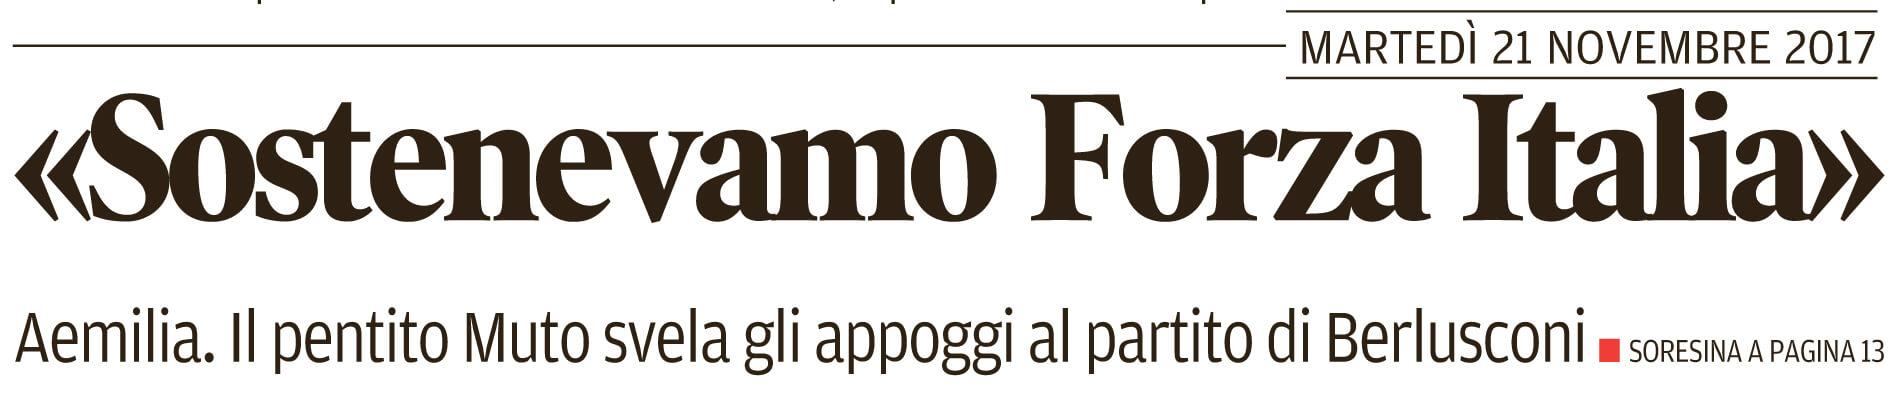 Sostenevamo Forza Italia